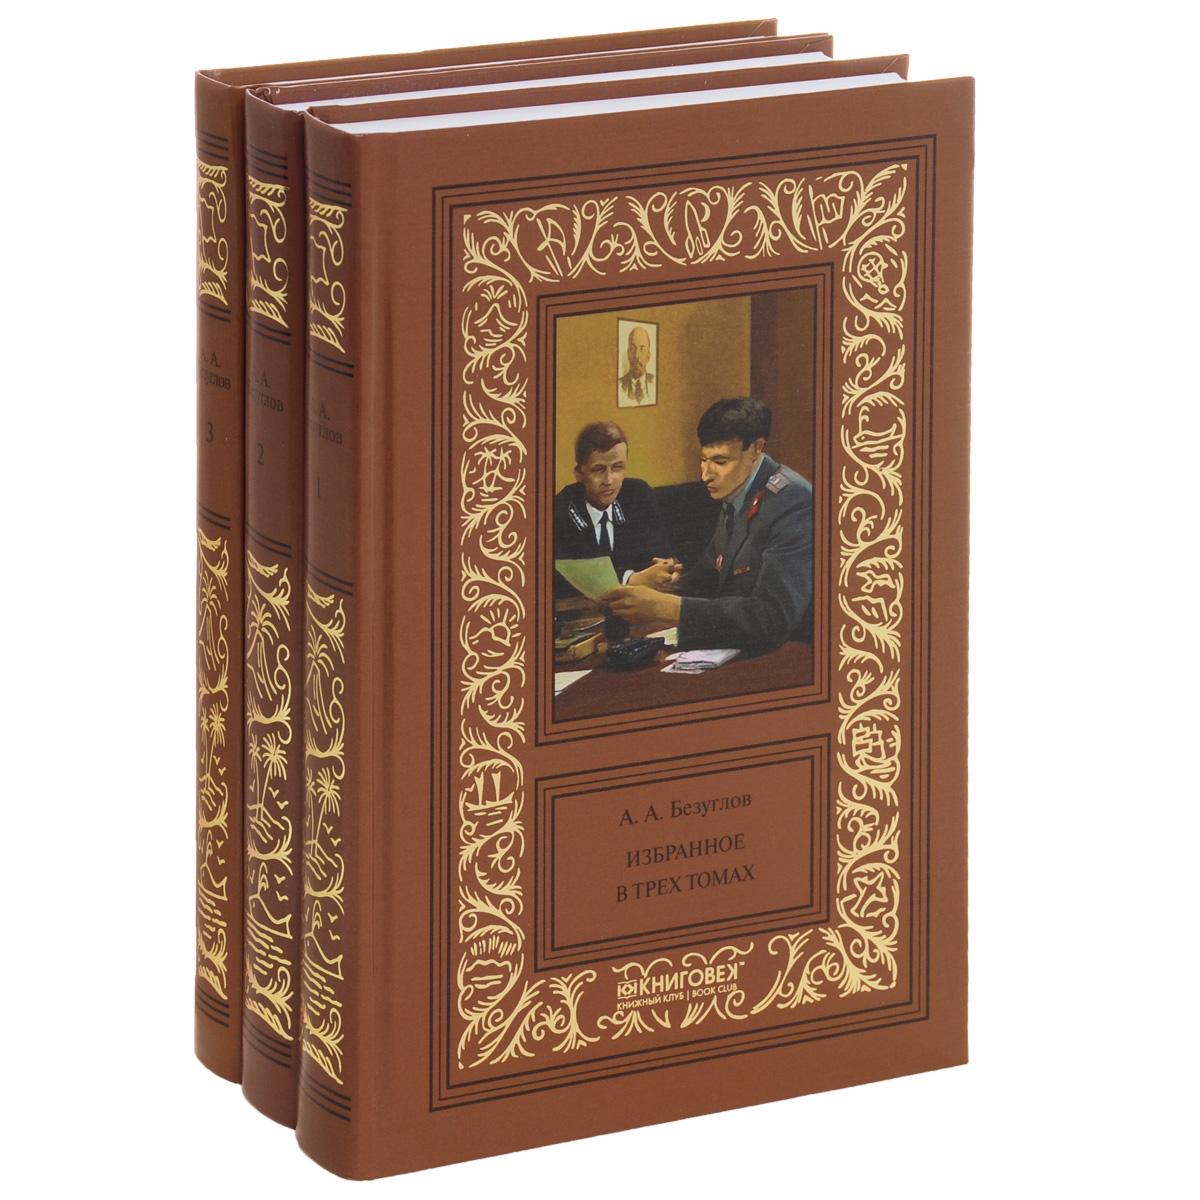 А. А. Безуглов А. А. Безуглов. Избранное. В 3 томах. (комплект из 3 книг) а с пушкин сочинения в 3 томах комплект из 3 книг